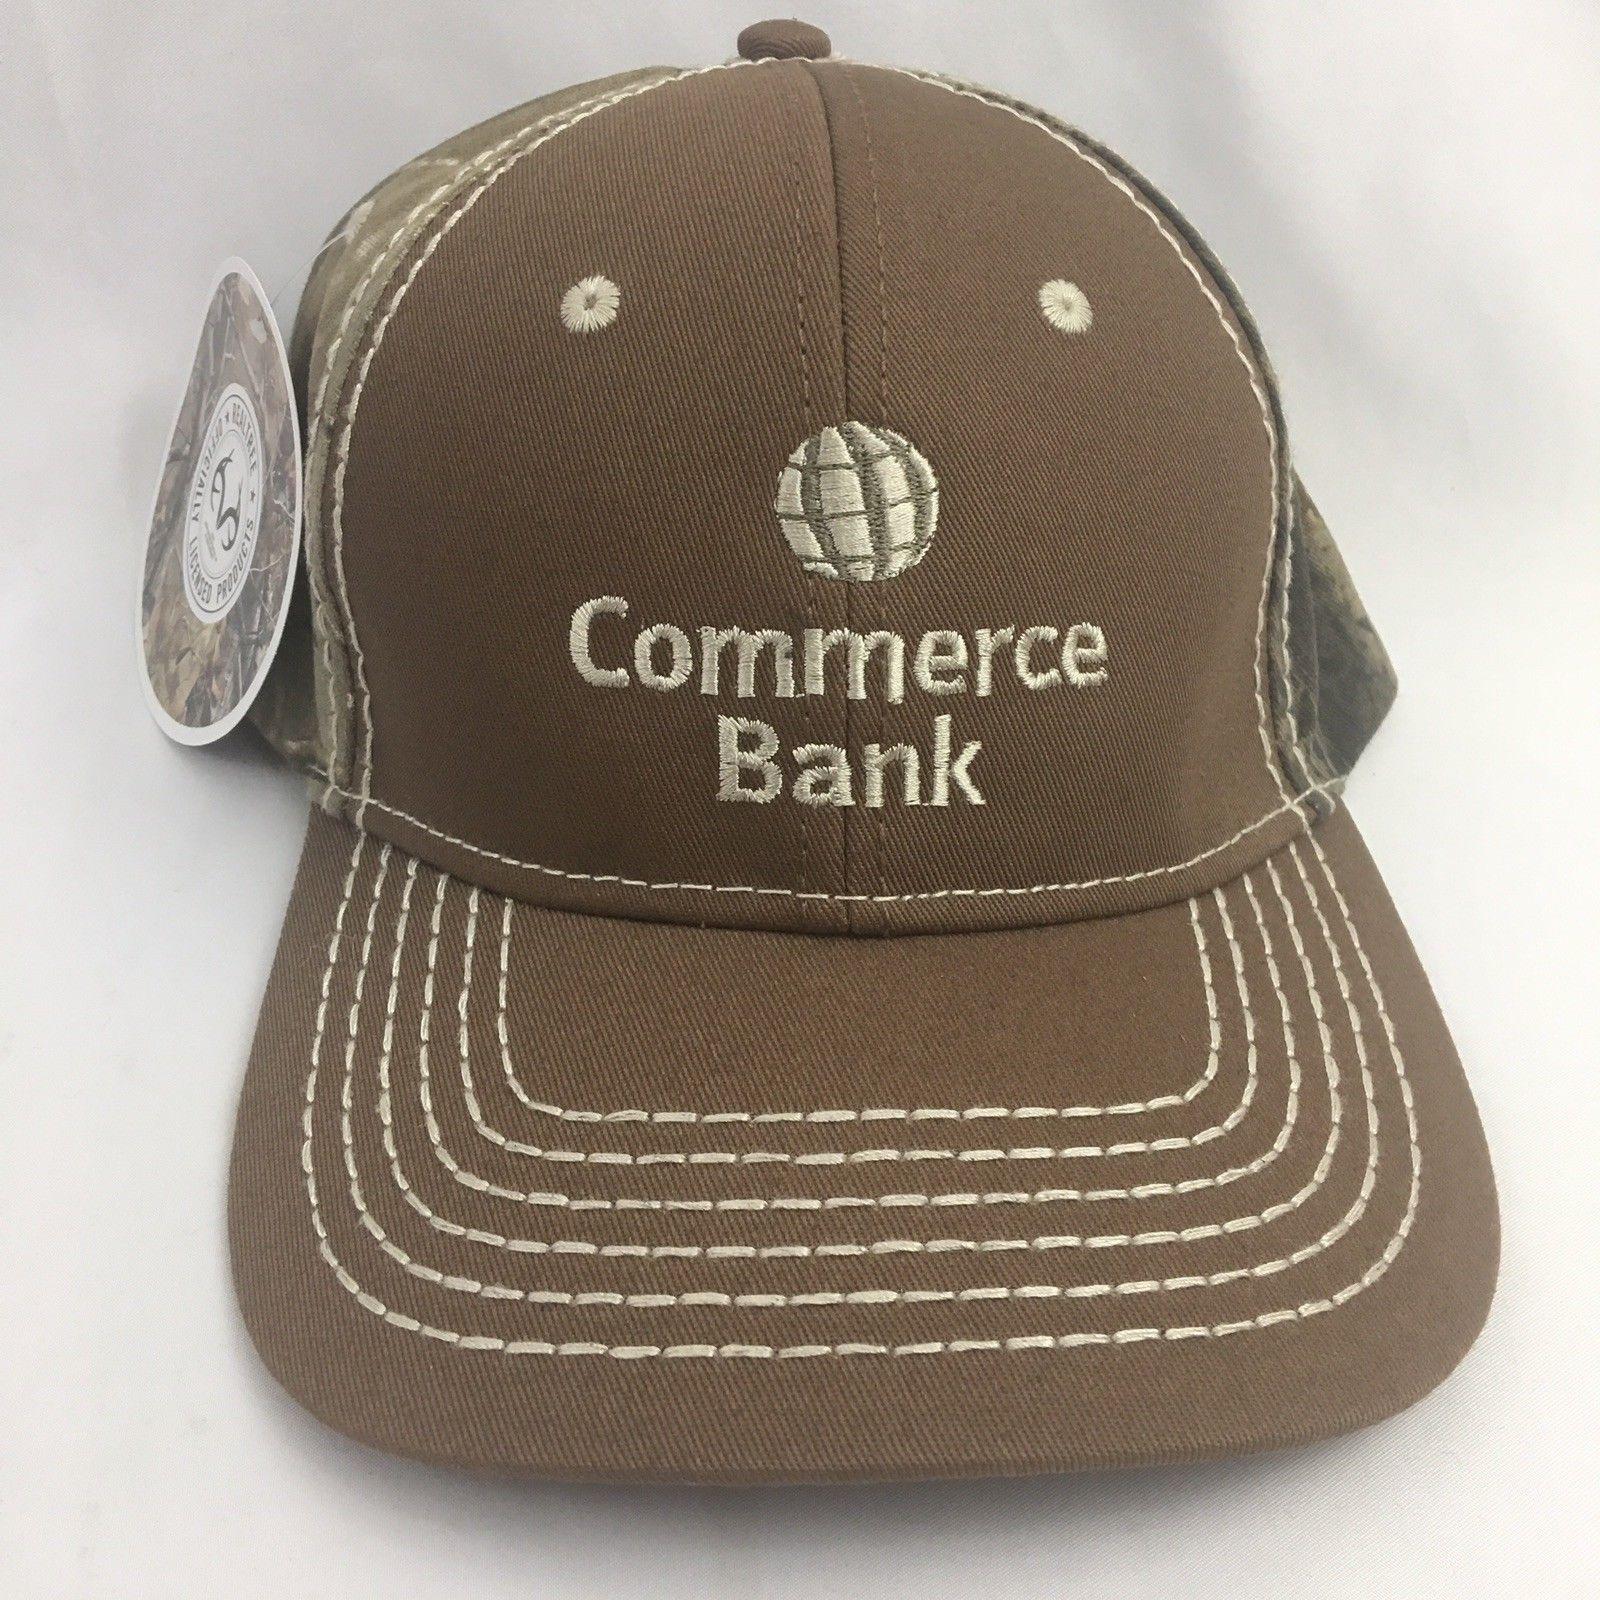 Commerce Bank Realtree Camo Baseball Cap Hat Embroidered Logo NWT Mens